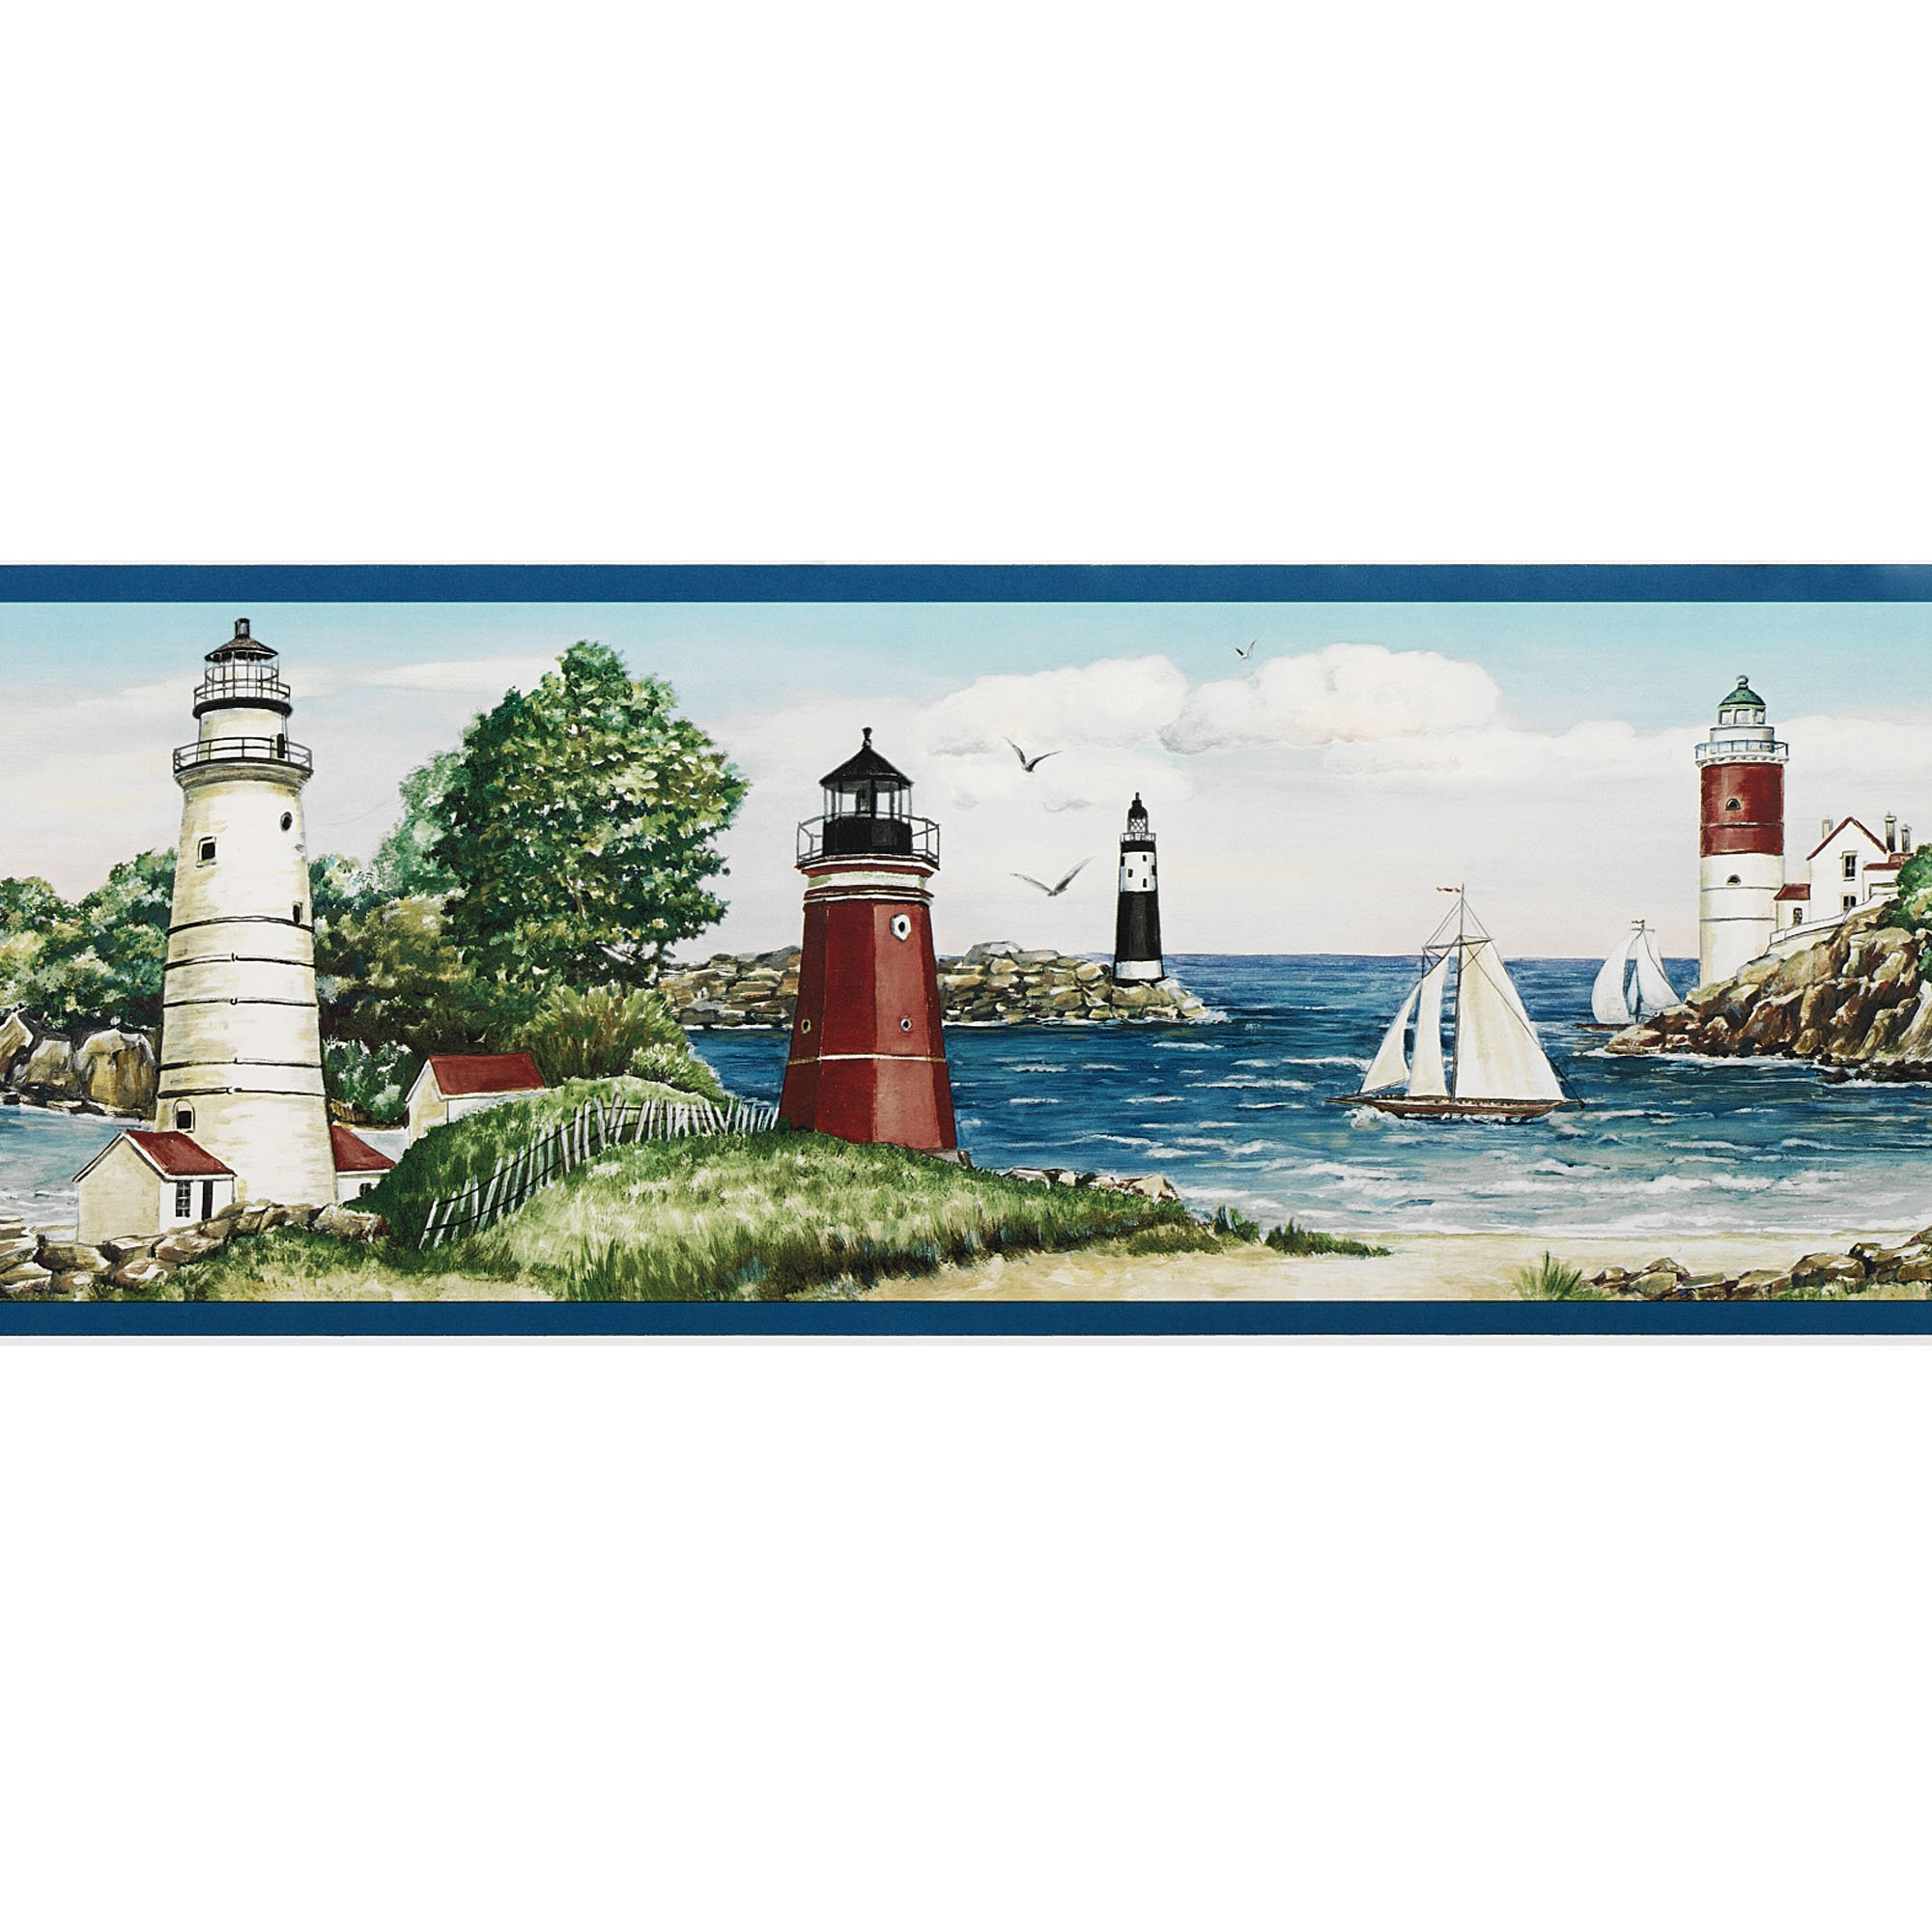 Home Lighthouse Sailboat Wallpaper Border Multi Warm 2000x2000